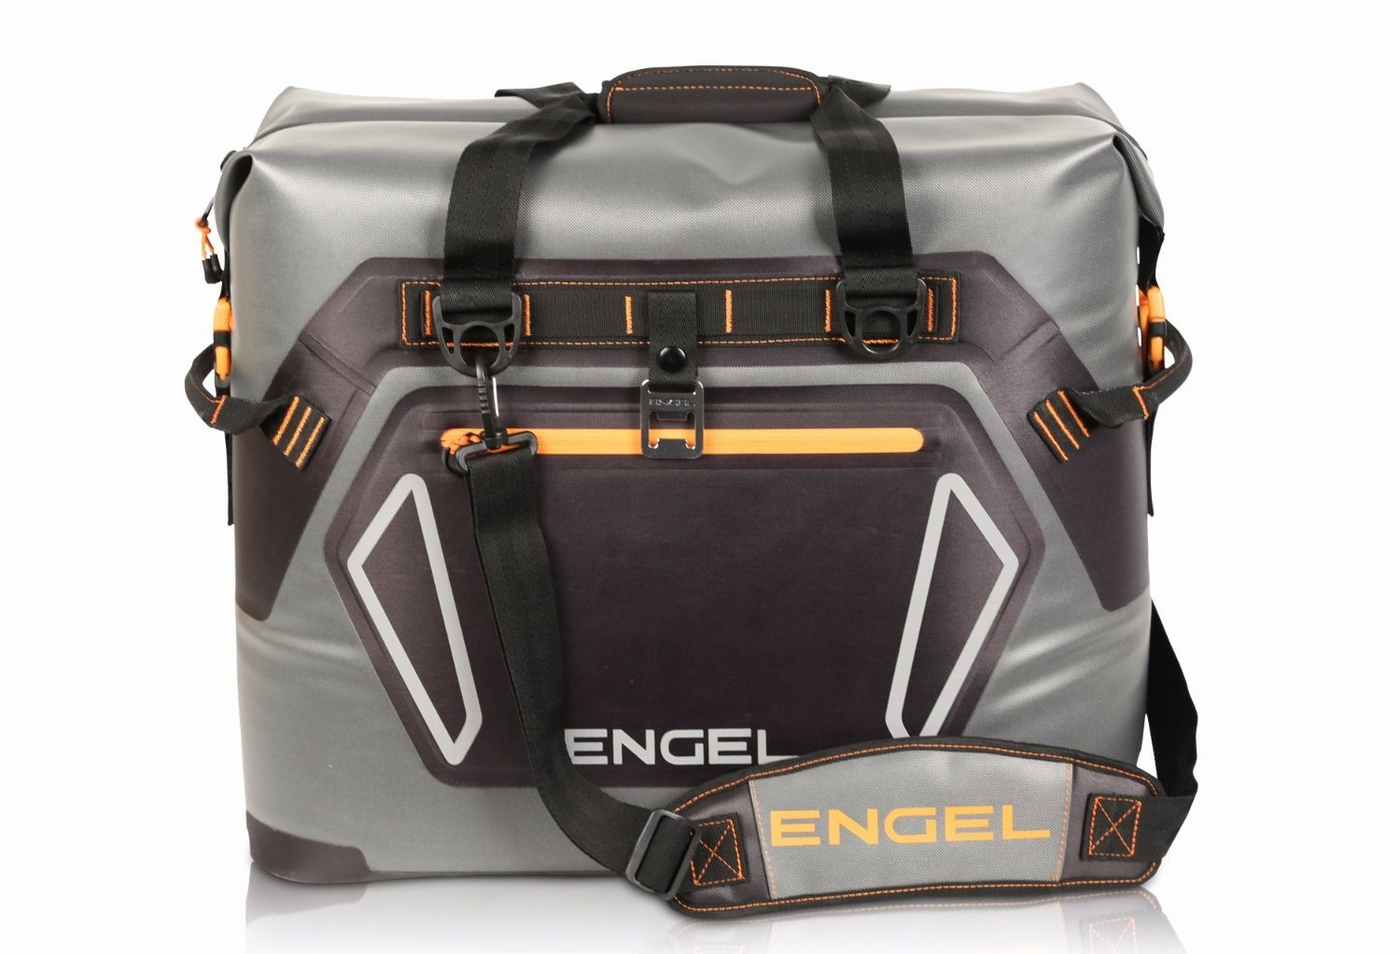 Engel Hd30 Waterproof Soft Sided Coolers Tackledirect